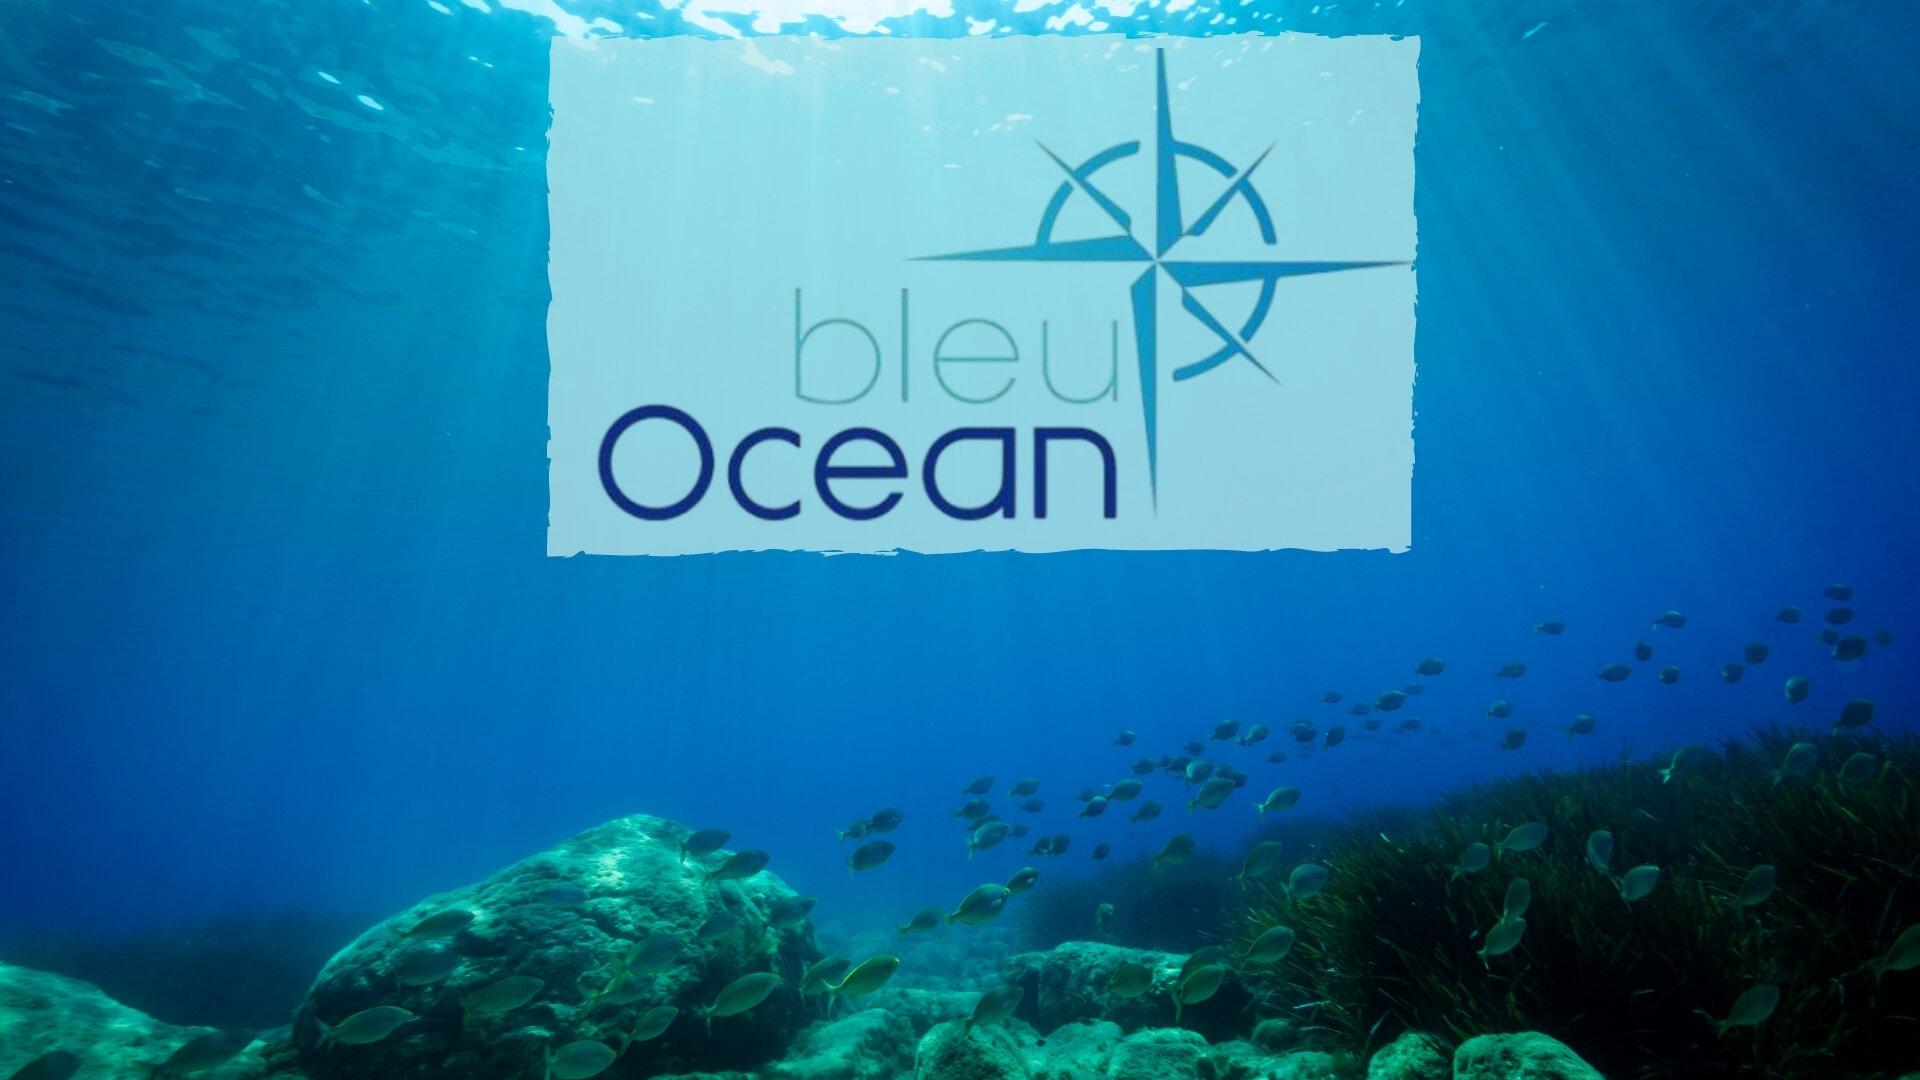 Bleu océan : Moorea Fishing Adventures et les engrais de poisson